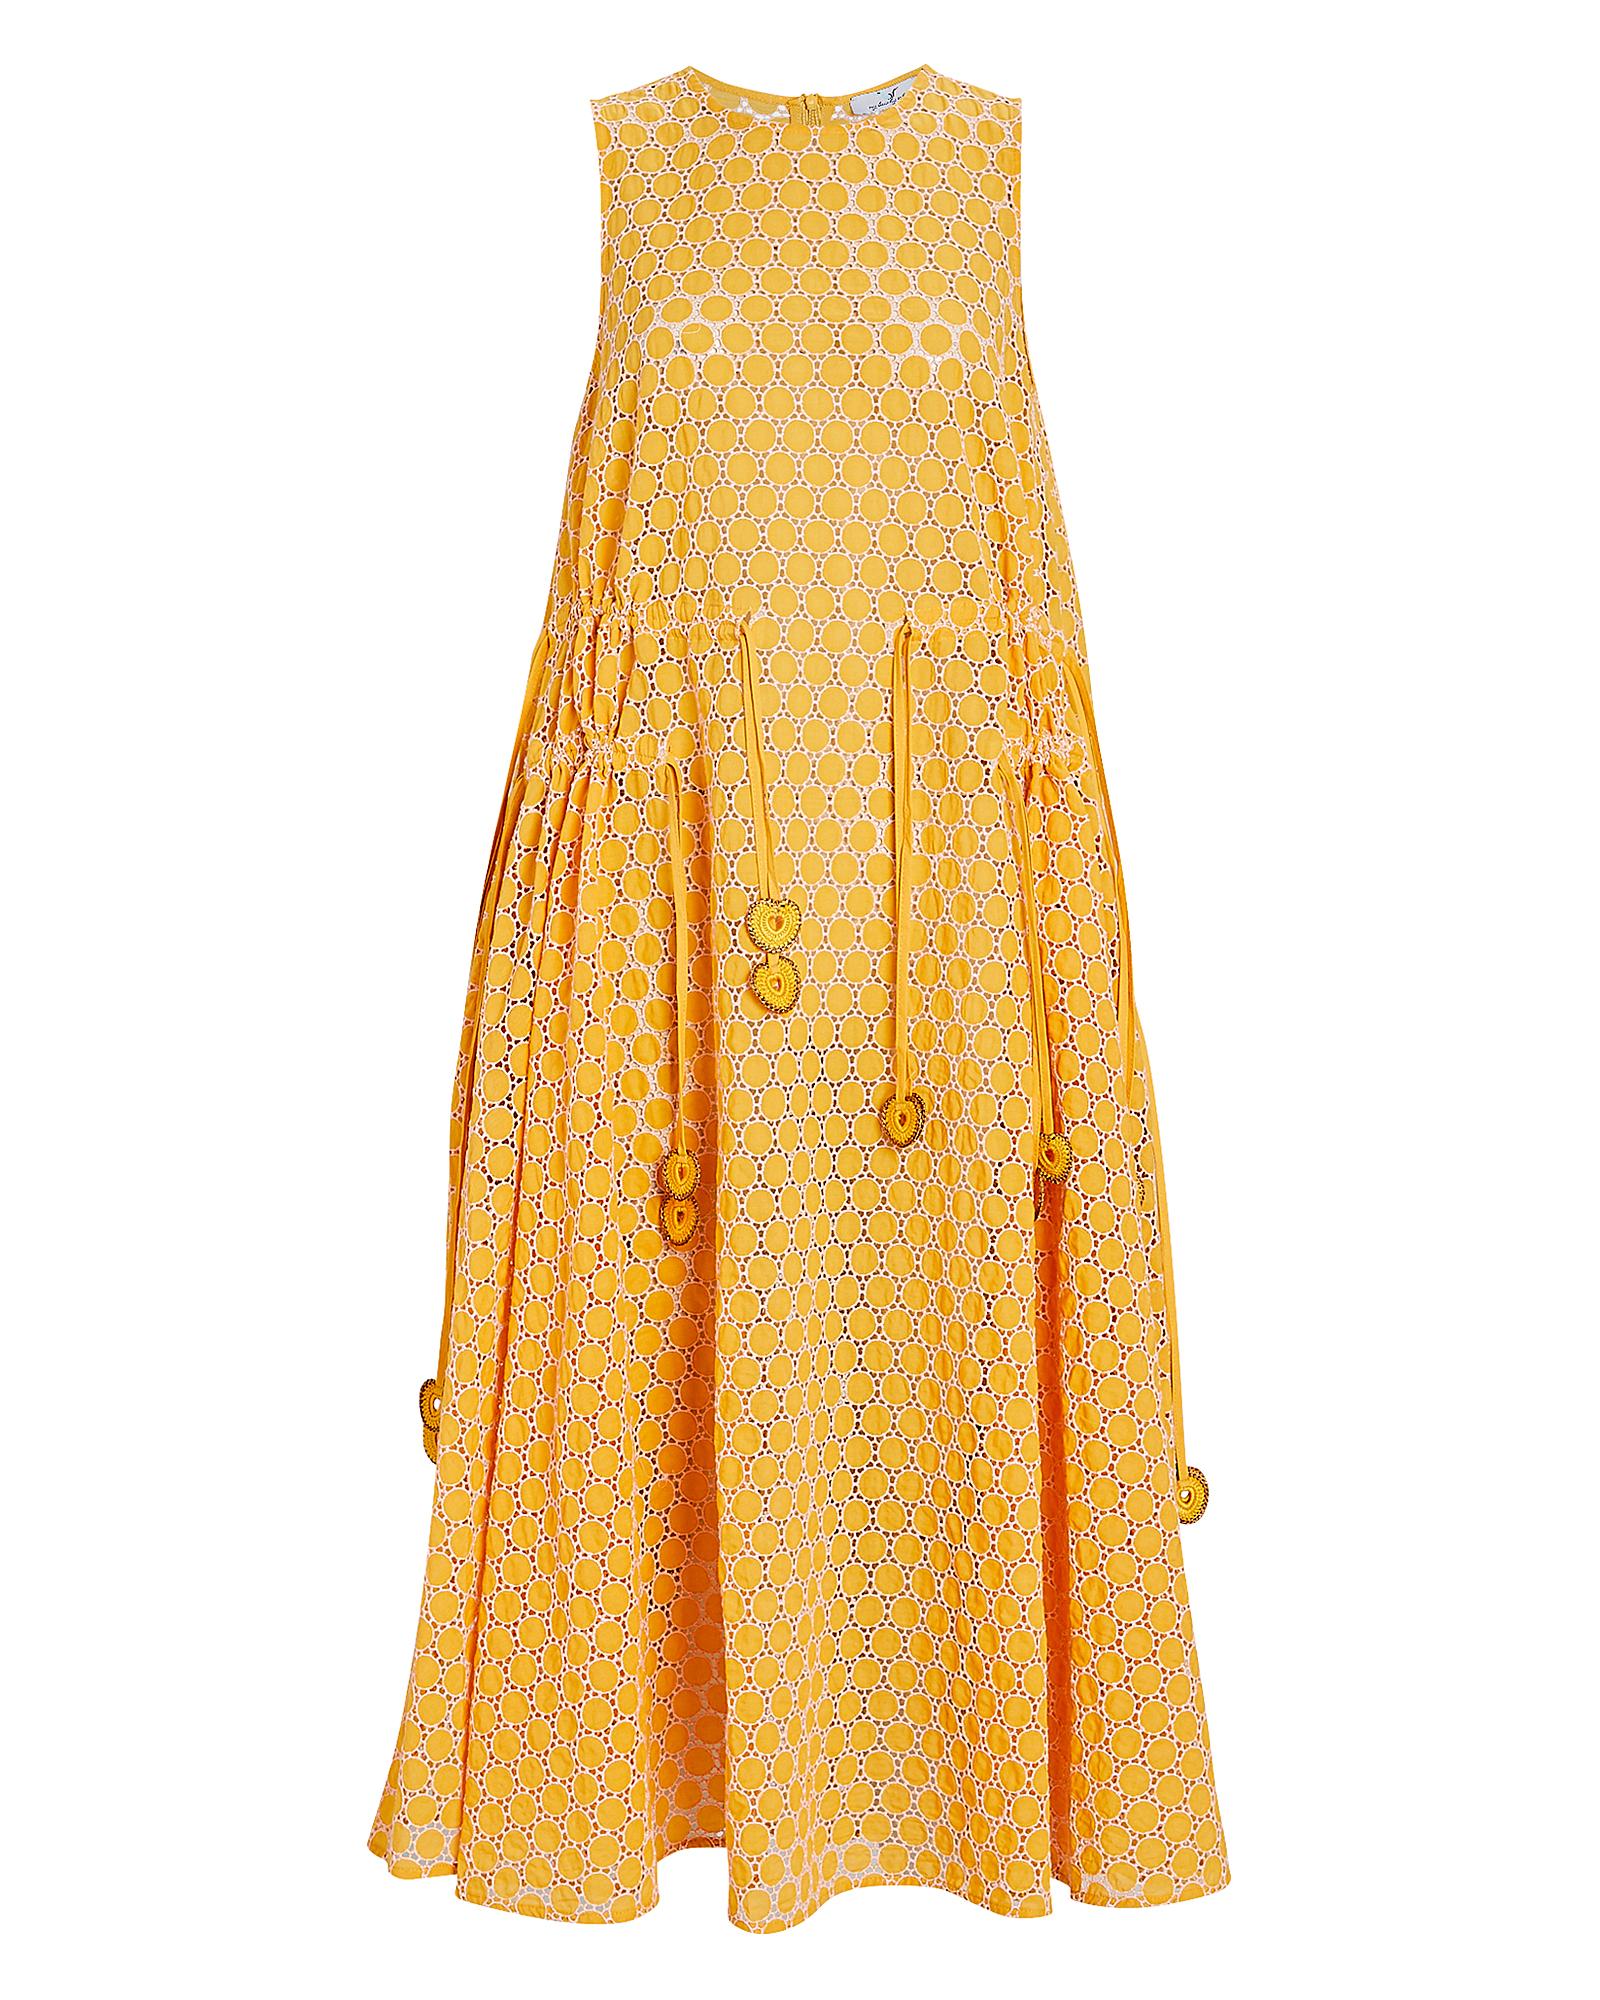 My Beachy Side Cotton Eyelet Midi Dress In Mustard